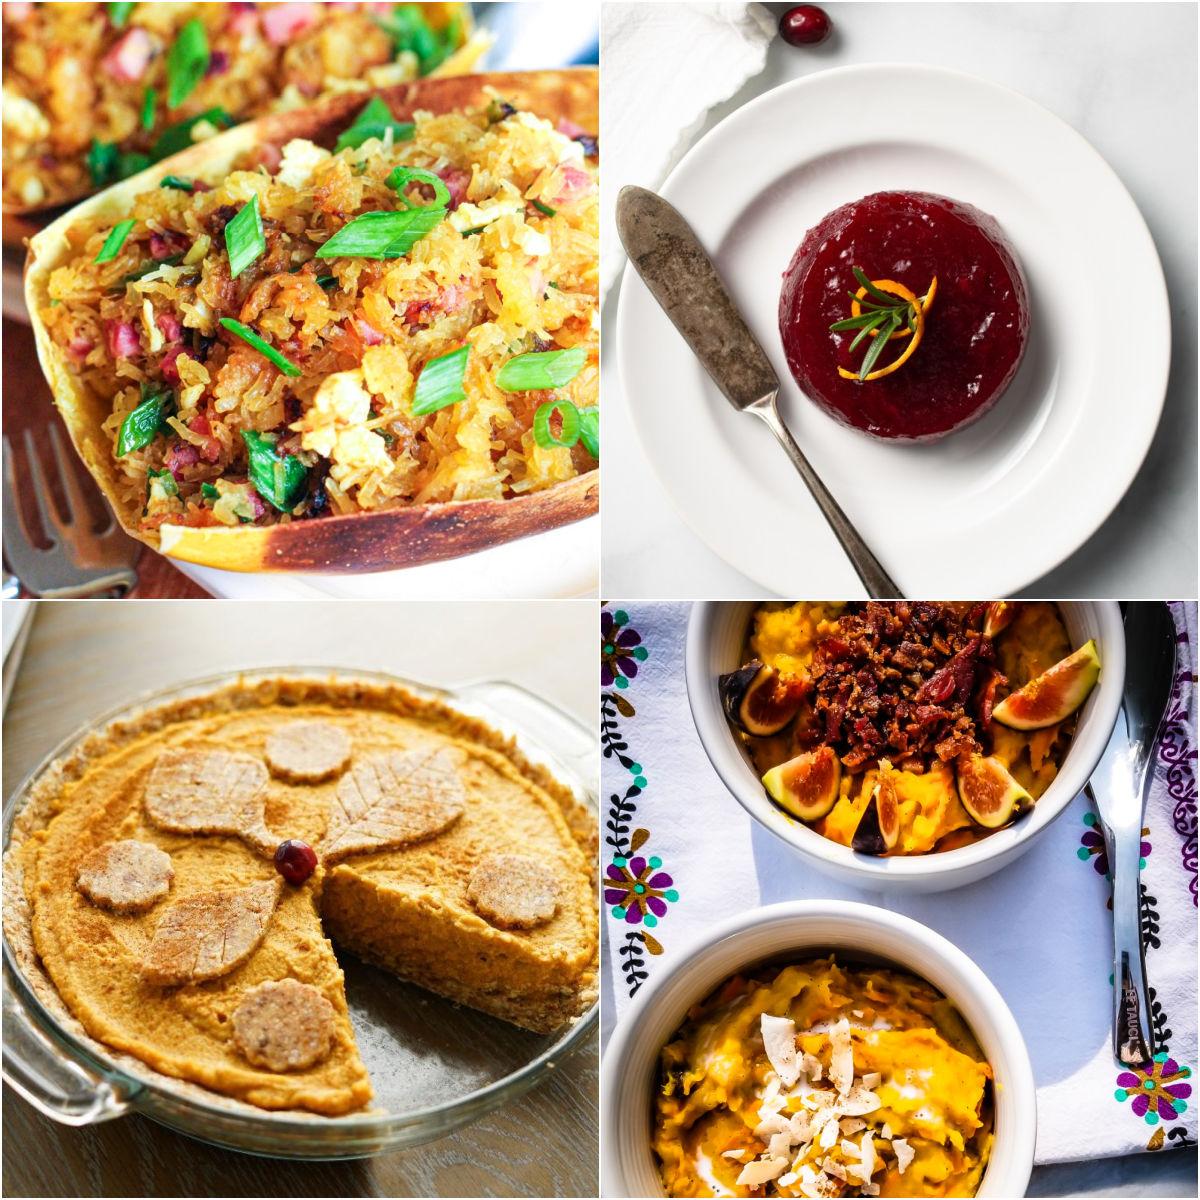 "Paleo AIP Recipe Roundtable #345 | Phoenix Helix - *Featured Recipes: Spaghetti Squash Fried ""Rice"", Pumpkin Pie, Jellied Cranberry Sauce, and Acorn Squash Porridge"